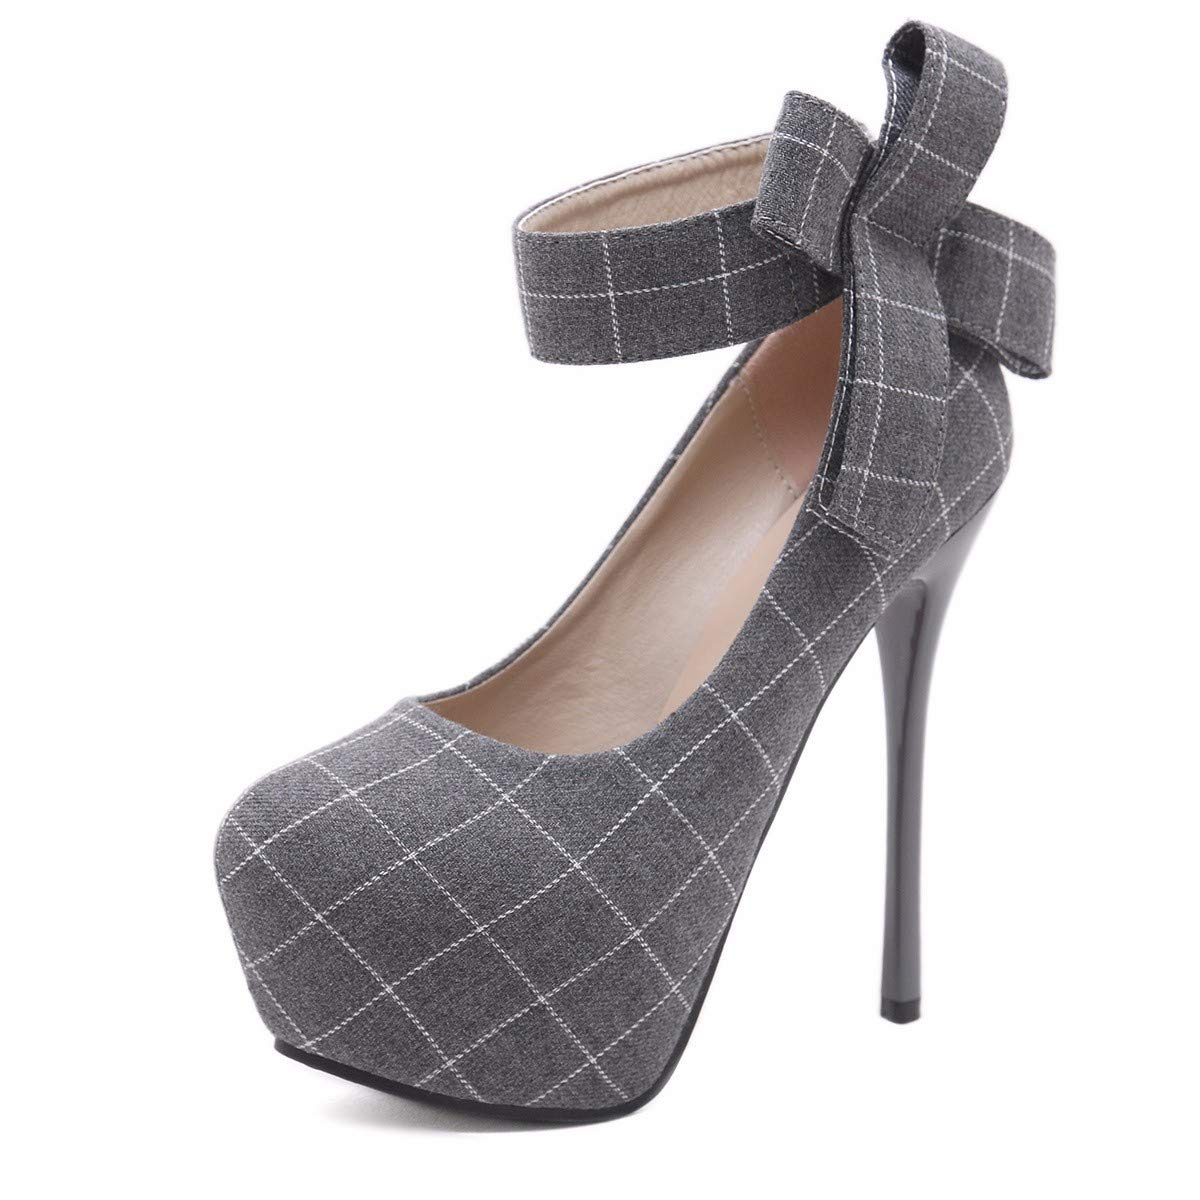 KPHY Damenschuhe/Nachtclubs Wasserdicht Tabellen Meine Schuhe 14 cm Super - High Heels Flach Einzelne Schuhe Damenschuhe.